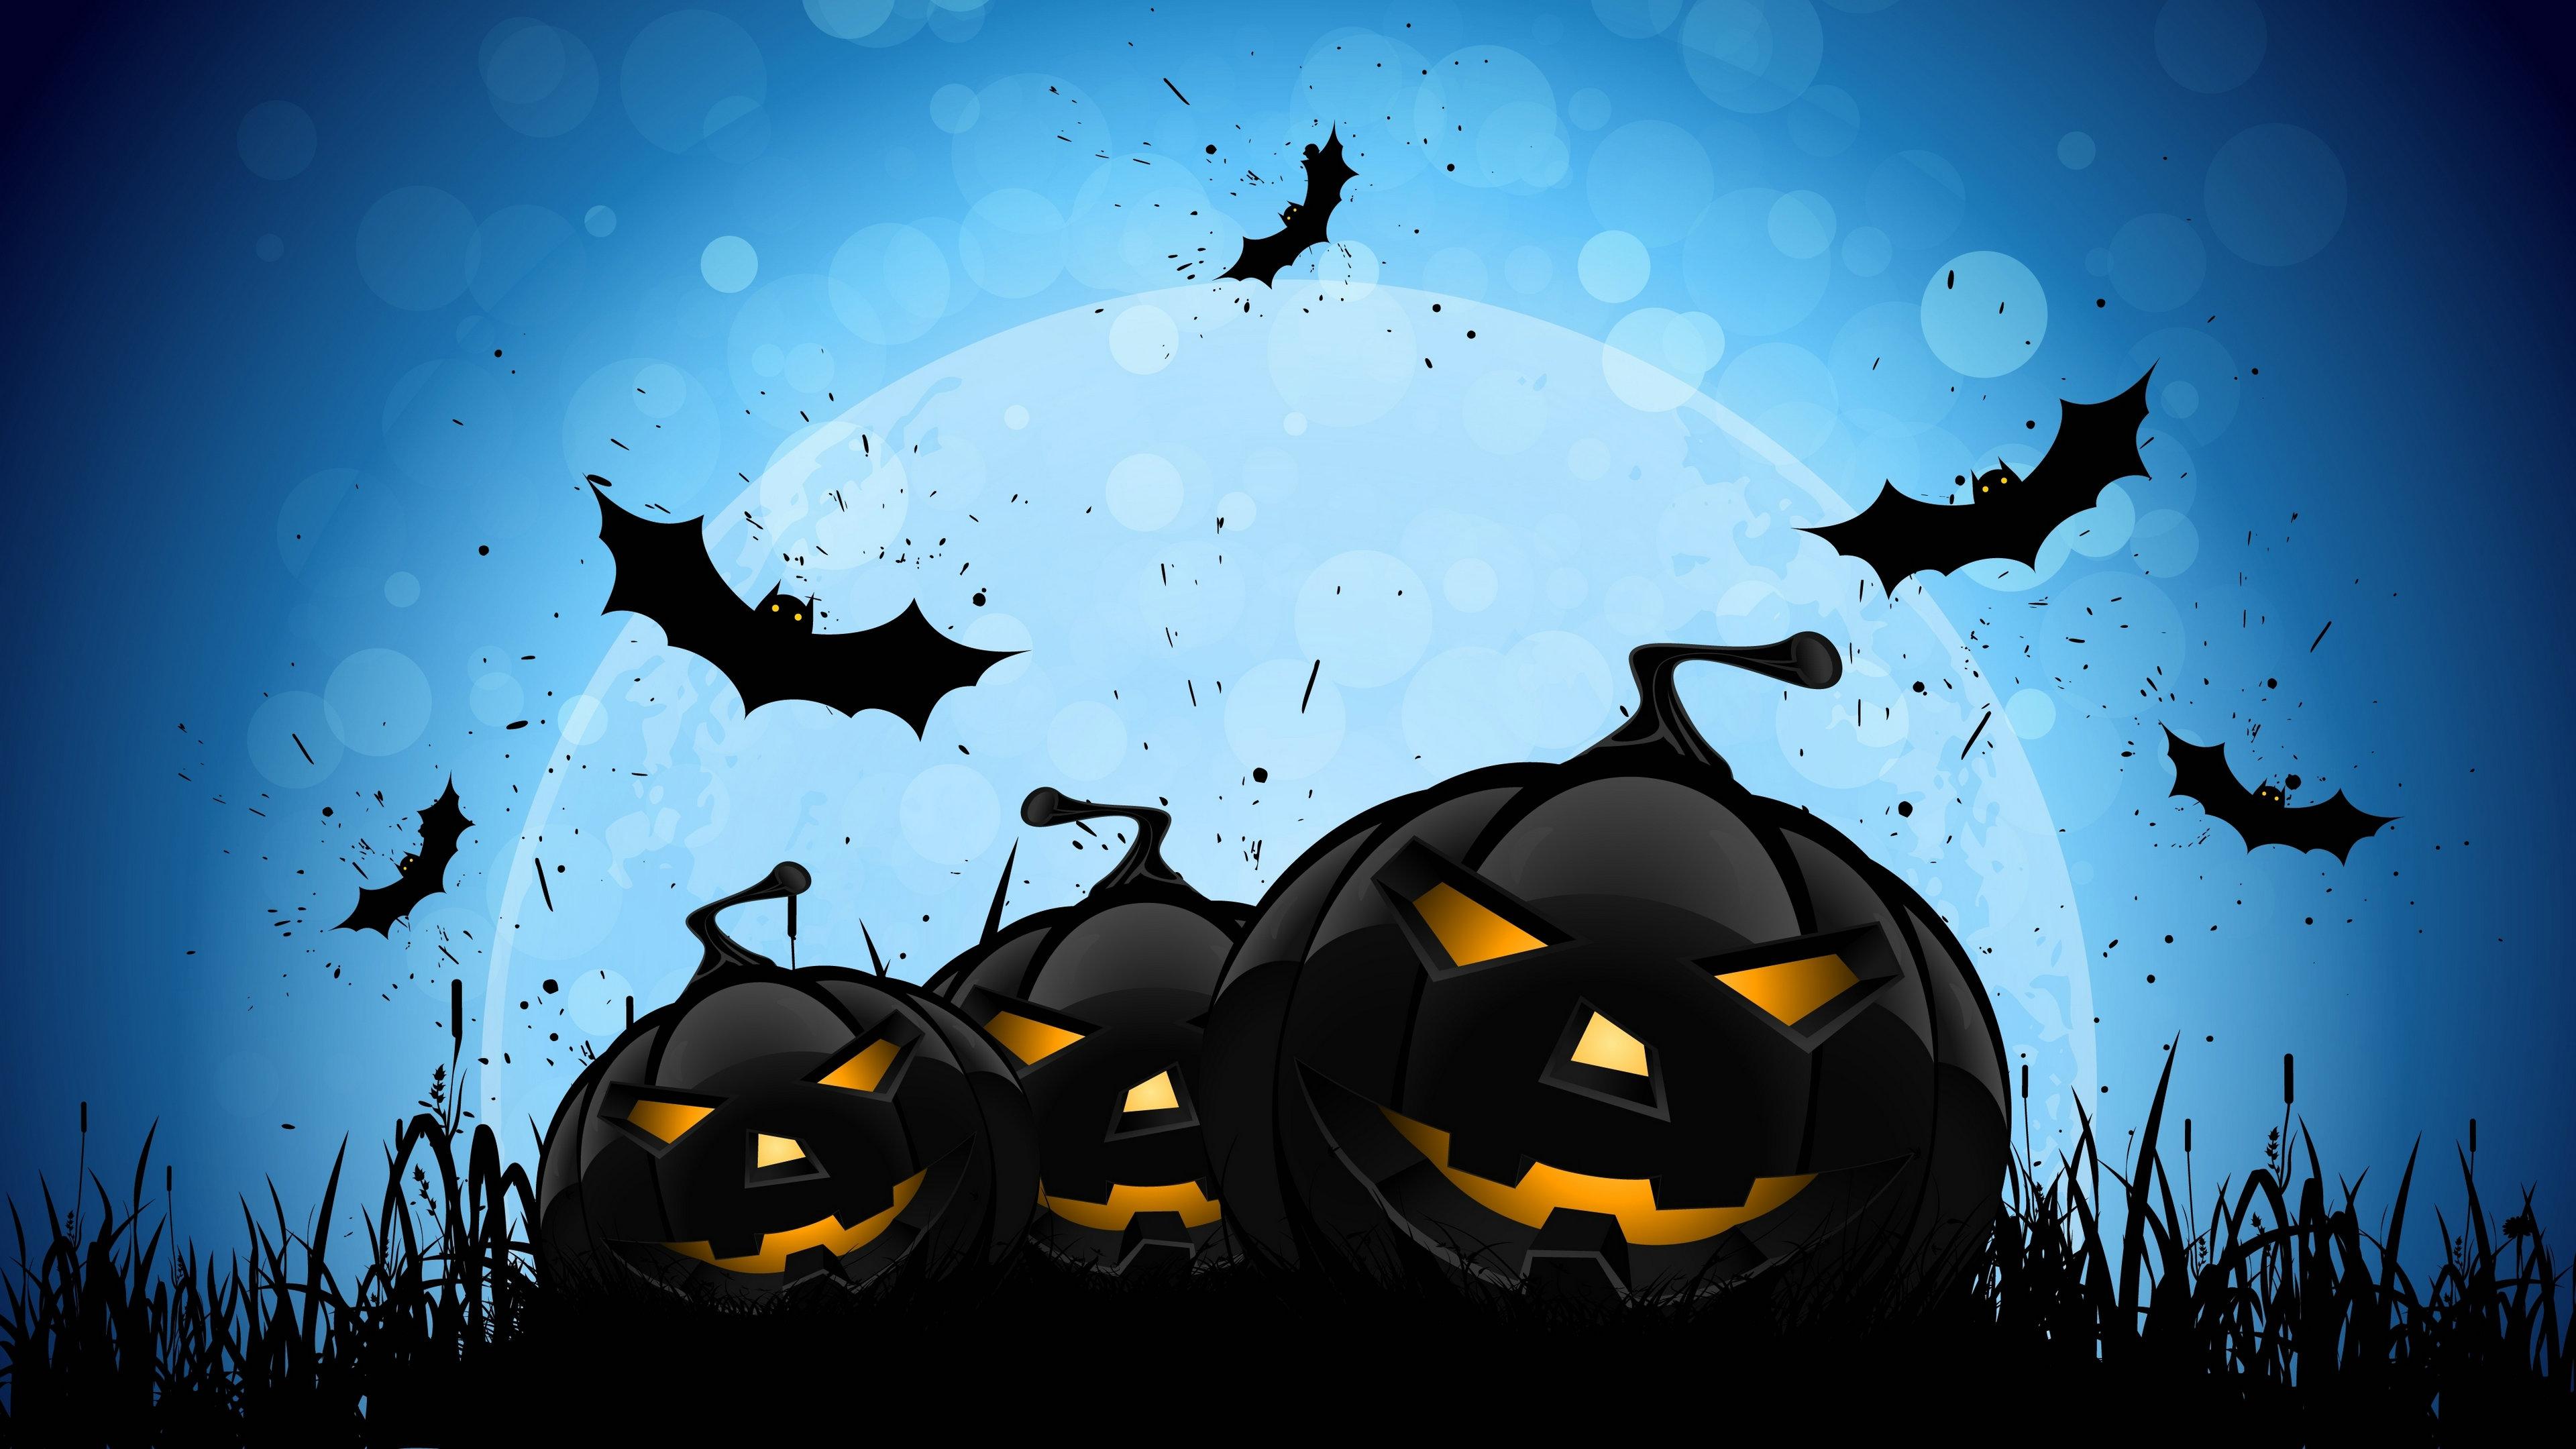 Halloween wallpaper 3840x2160 47196 3840x2160